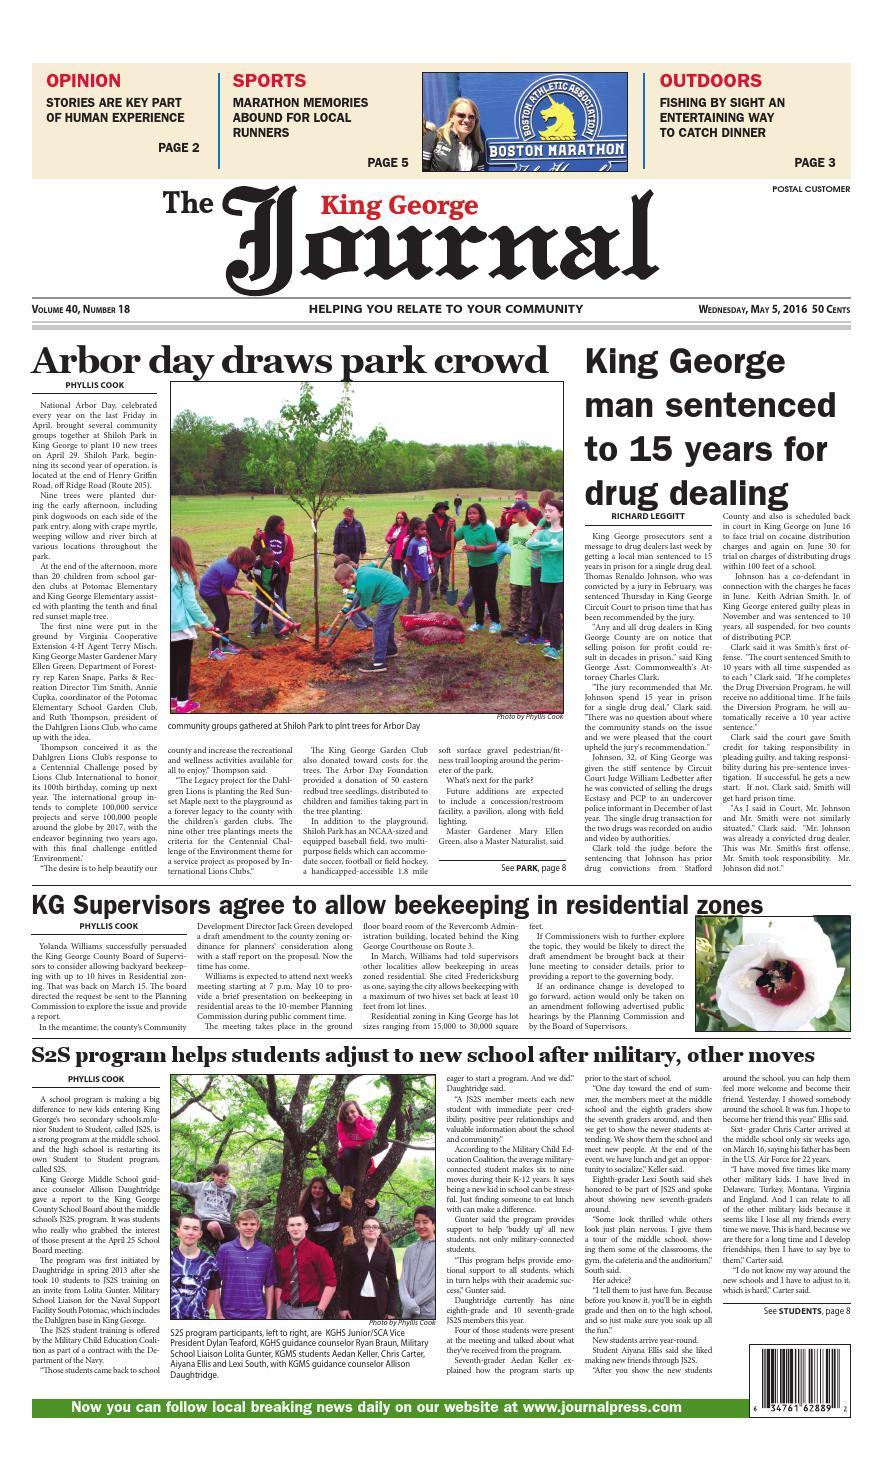 05 04 2016 king george journal by journalpressinc issuu